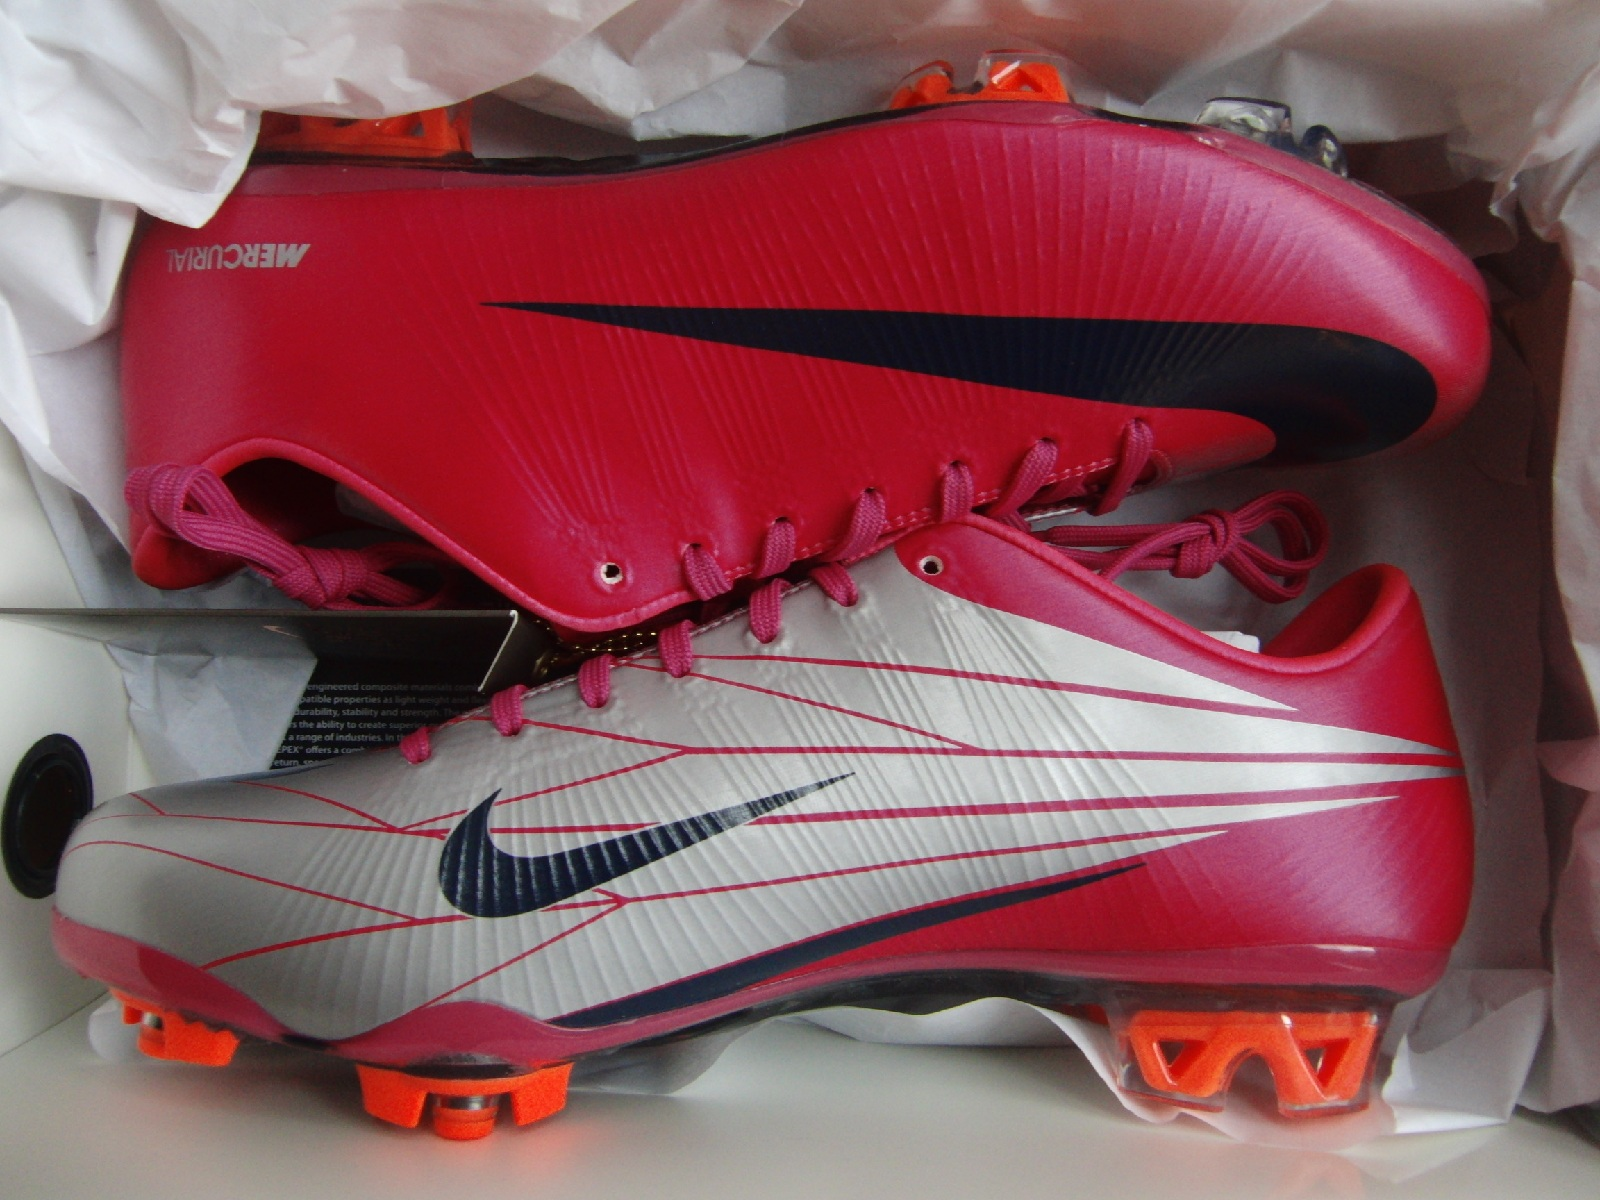 online retailer b0004 ba33e Nike Mercurial Superfly II Cherry - Giveaway! | Soccer ...